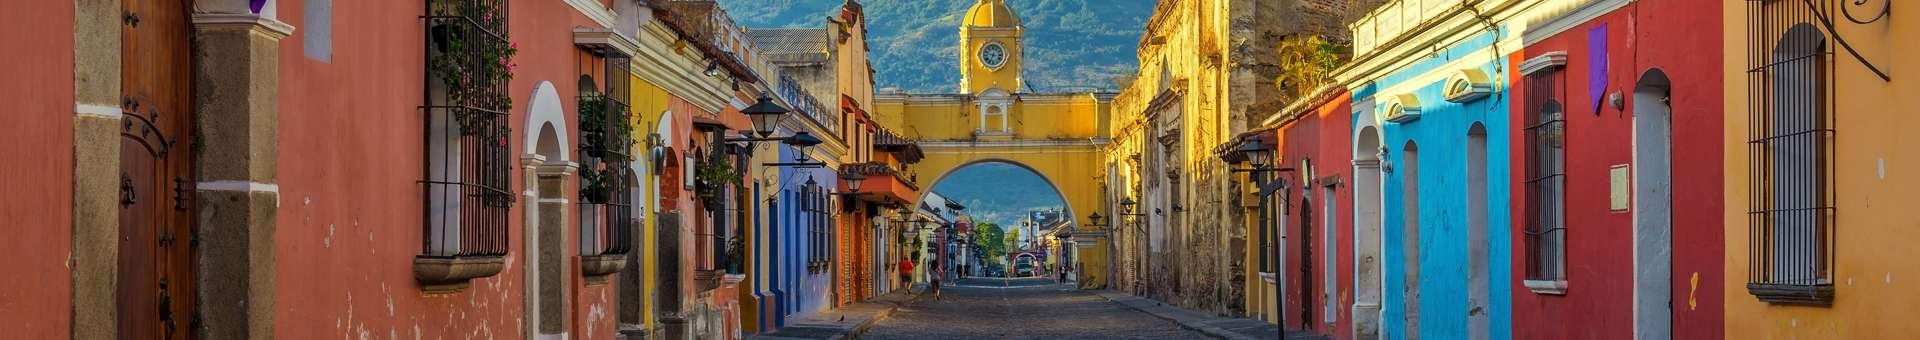 Búsqueda de información Whois de nombres de dominios en Antigua